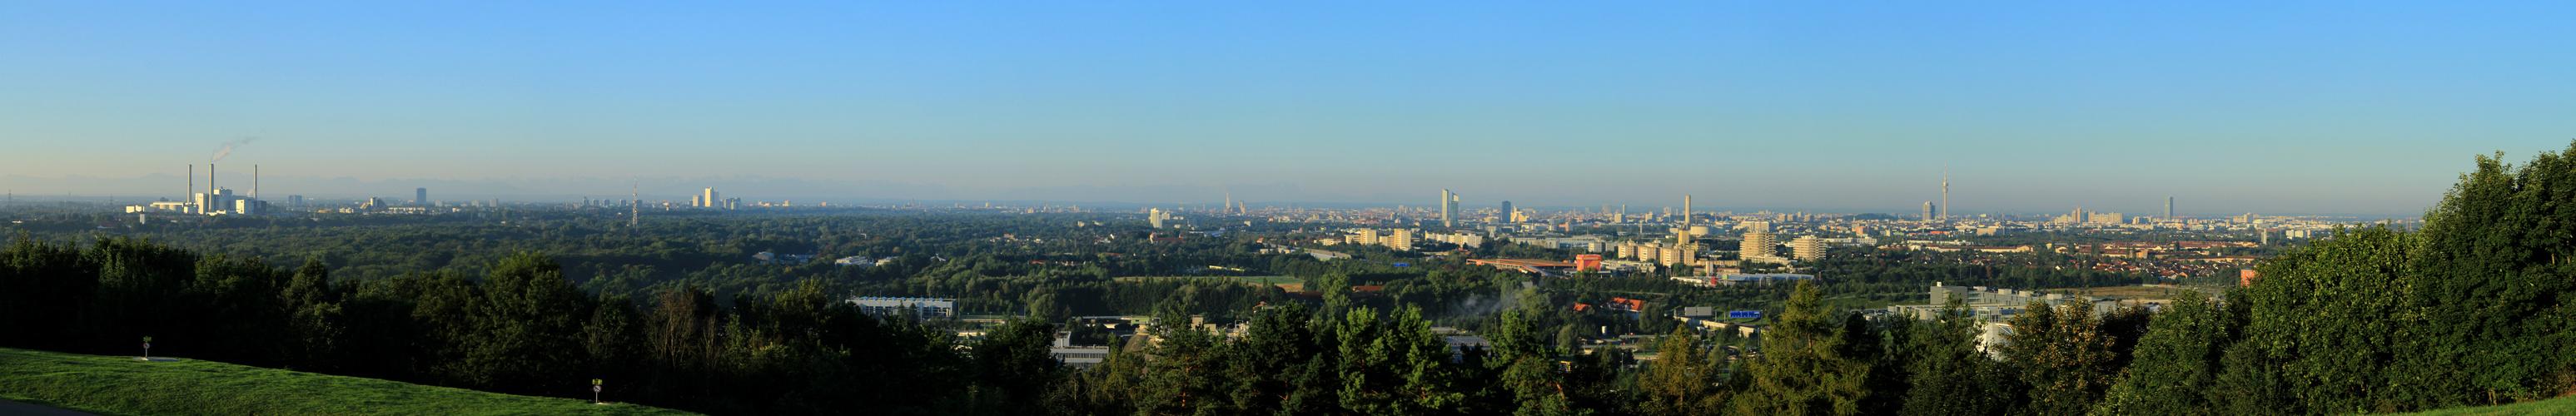 München Panorama #2